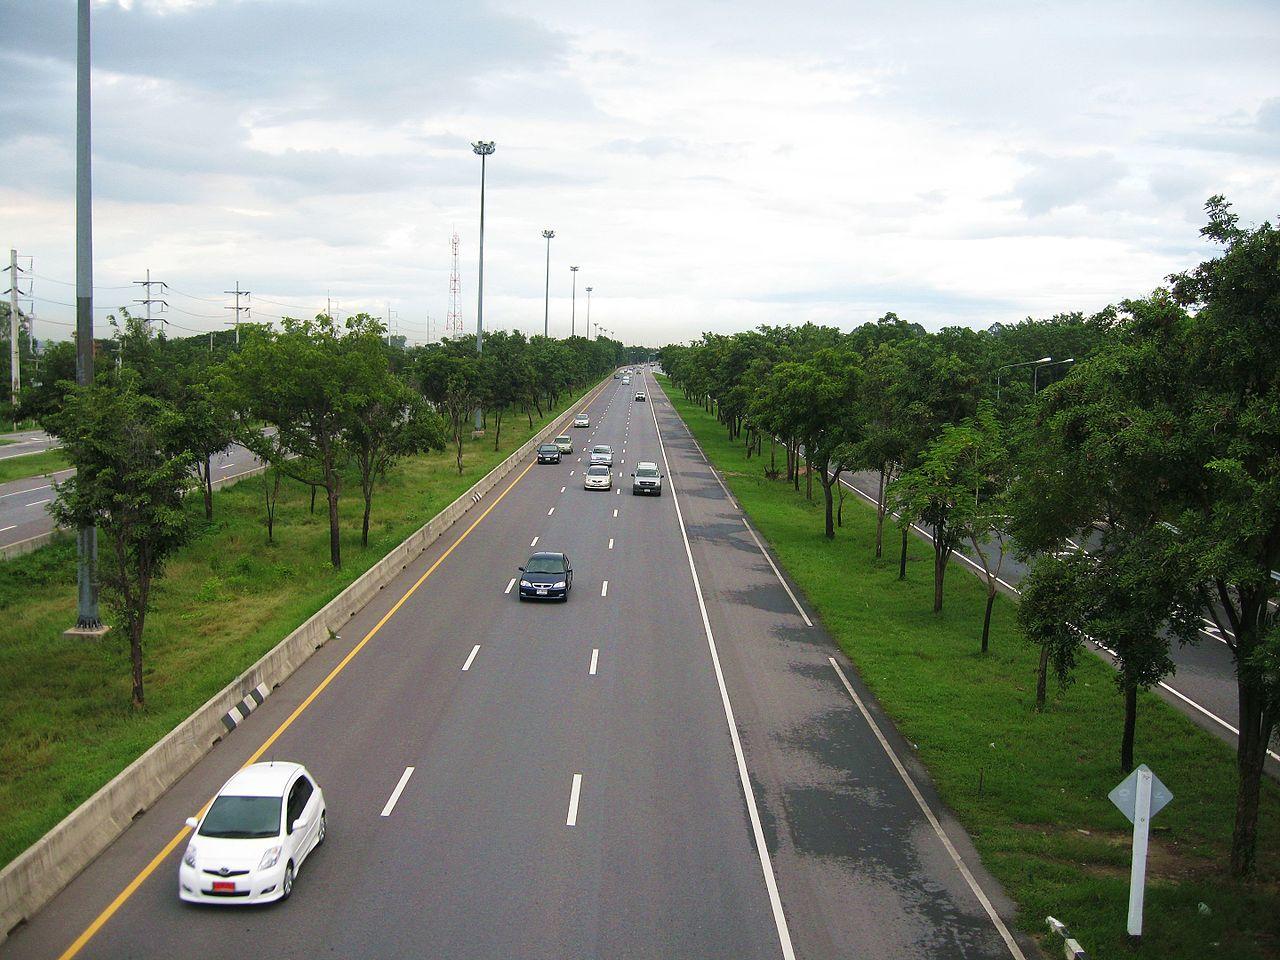 Foreigners Among 14 Killed in Sing Buri Van Crash: Police